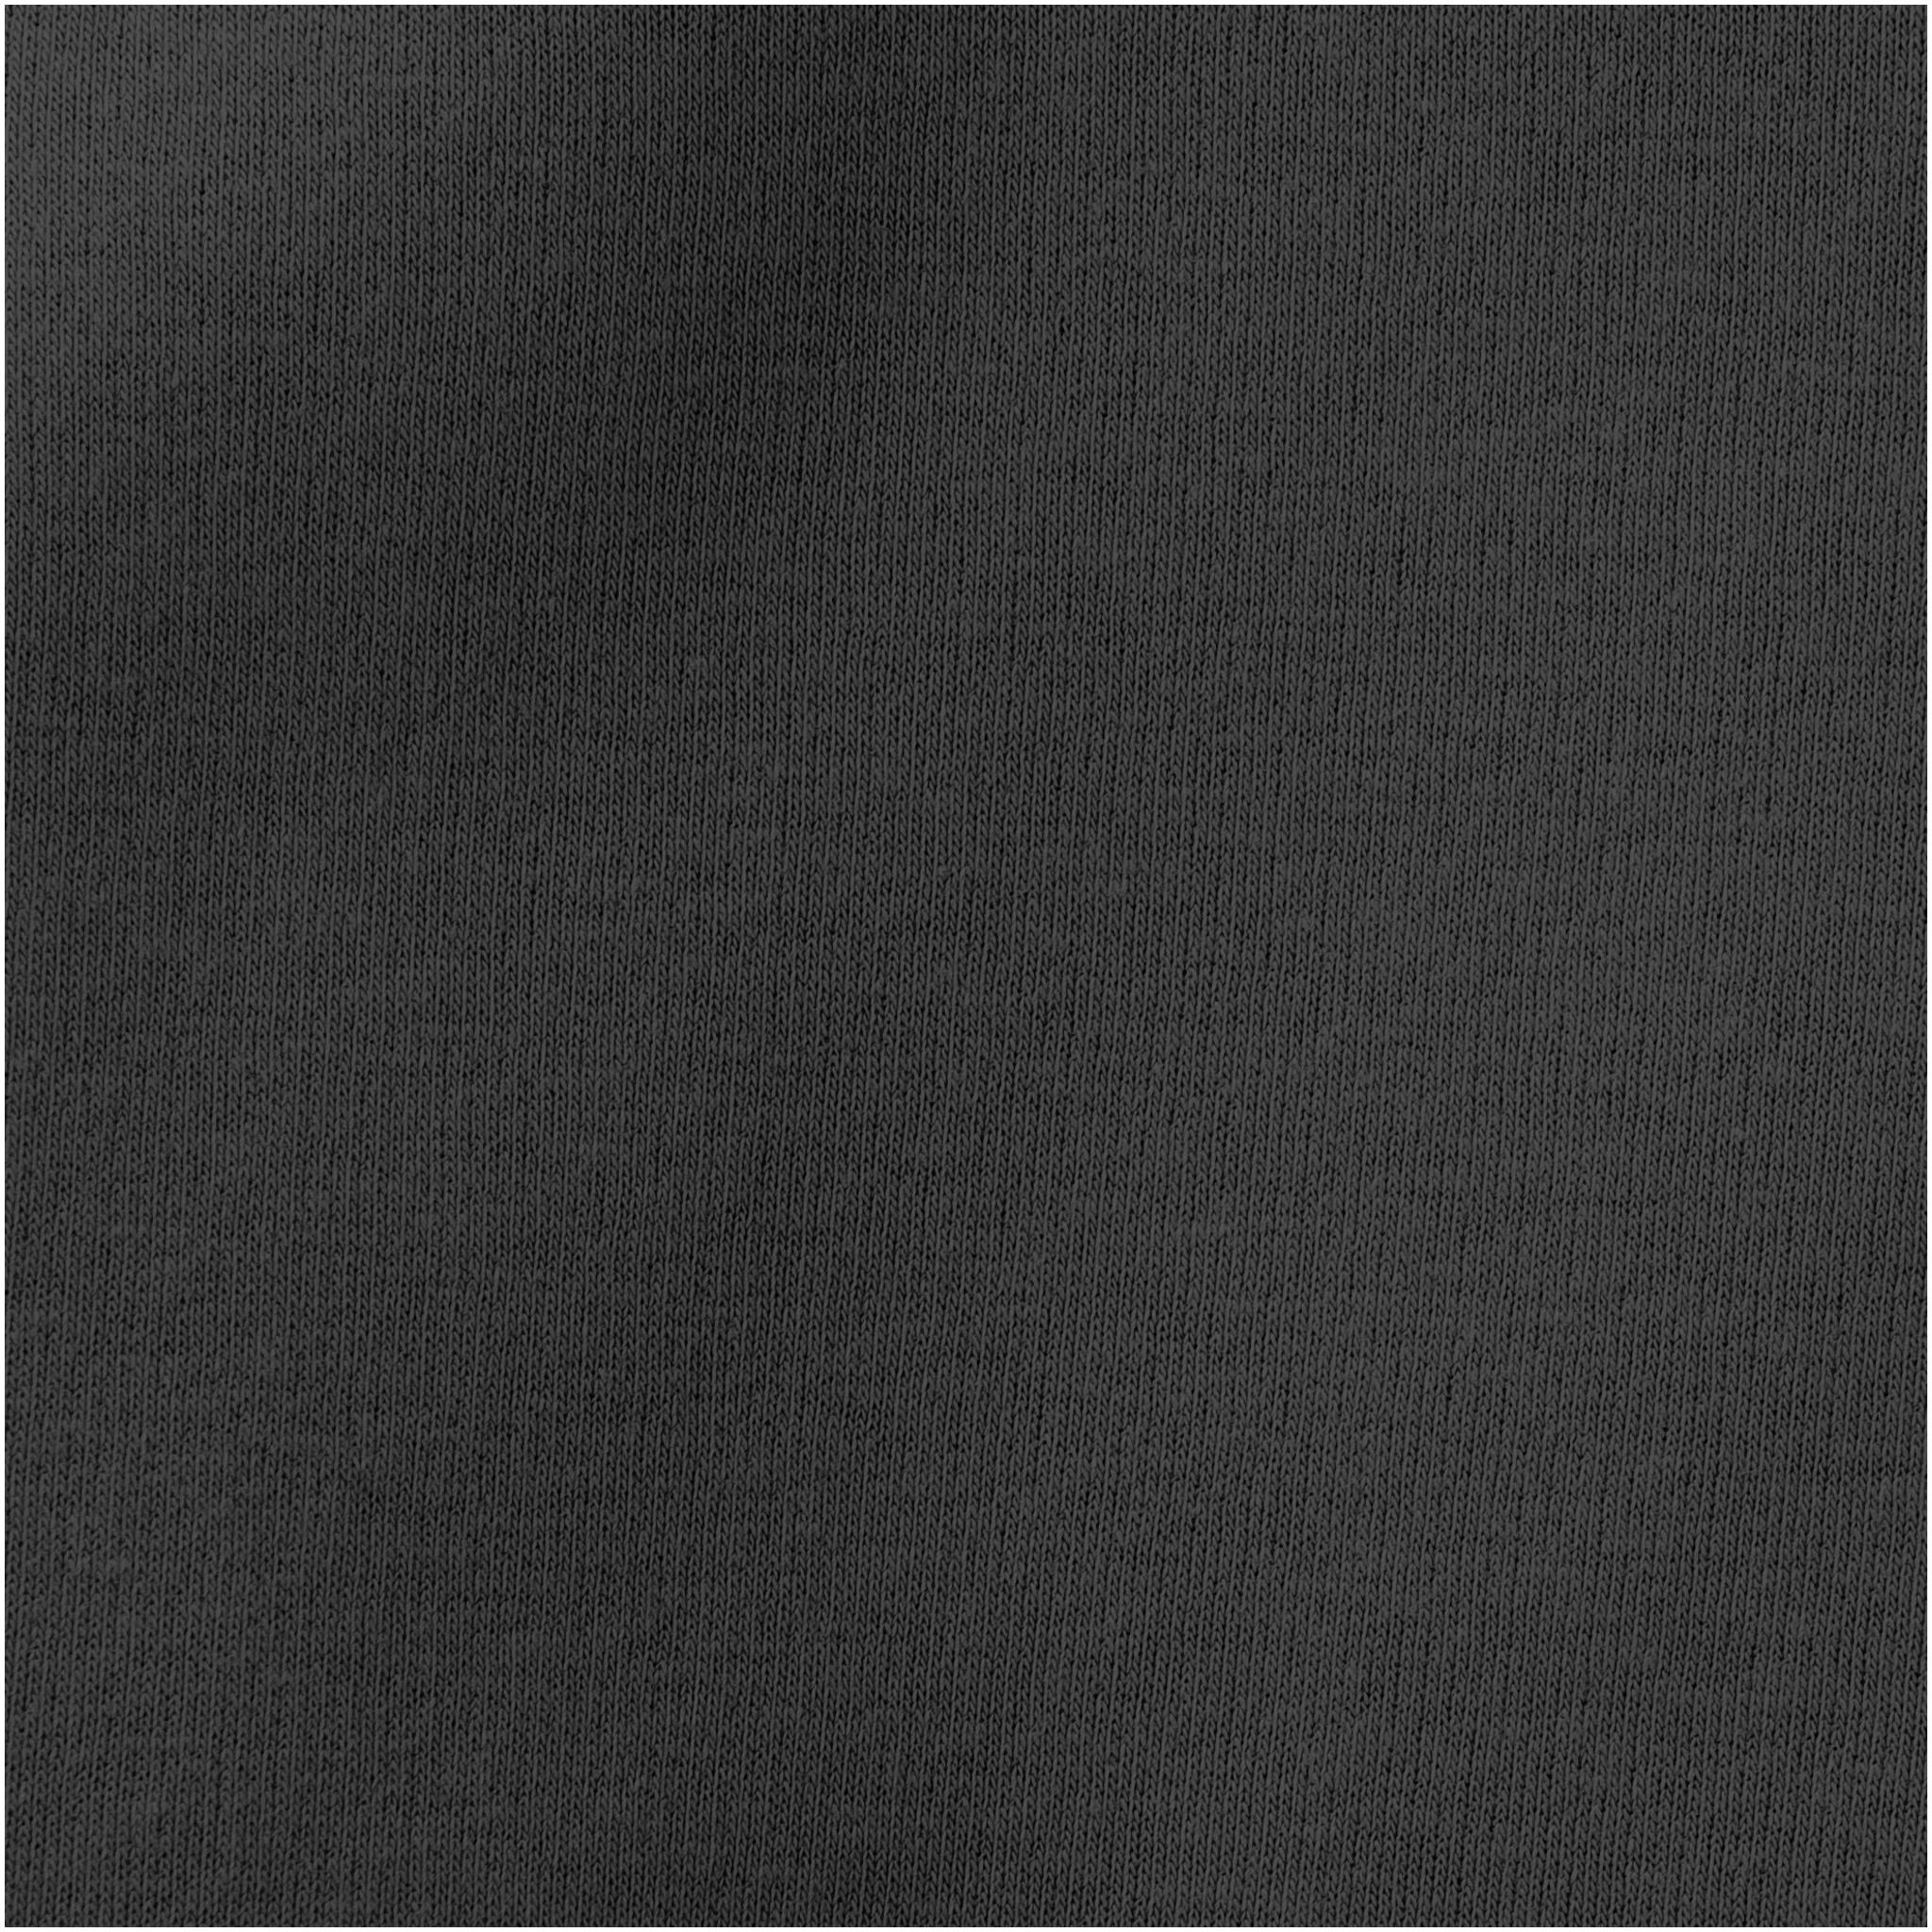 Neck Crew Elevate Surrey pf1849 Sweater Mens TxwxEHtqnP